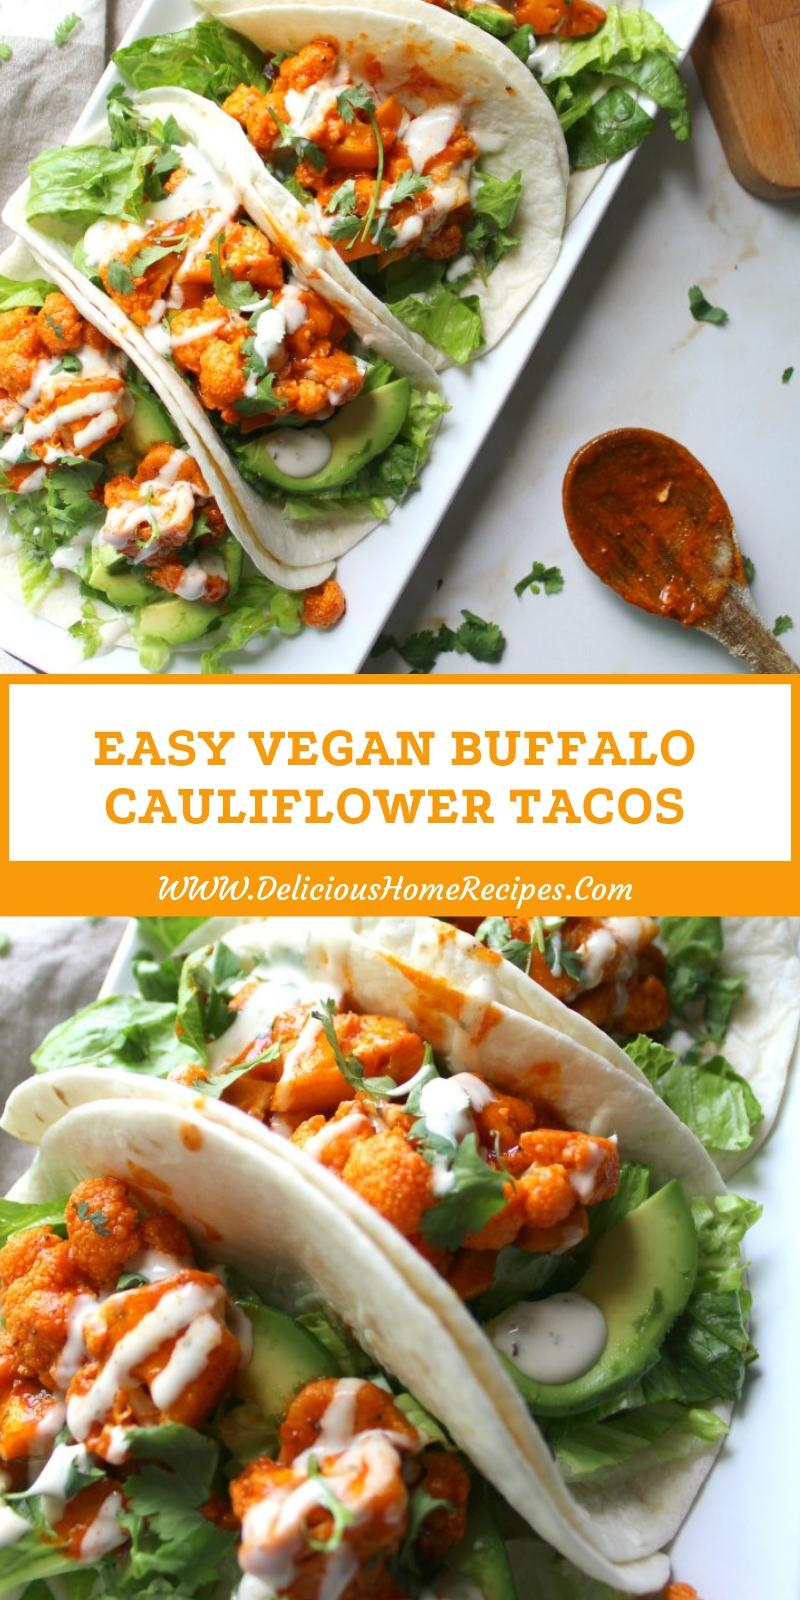 Easy Vegan Buffalo Cauliflower Tacos